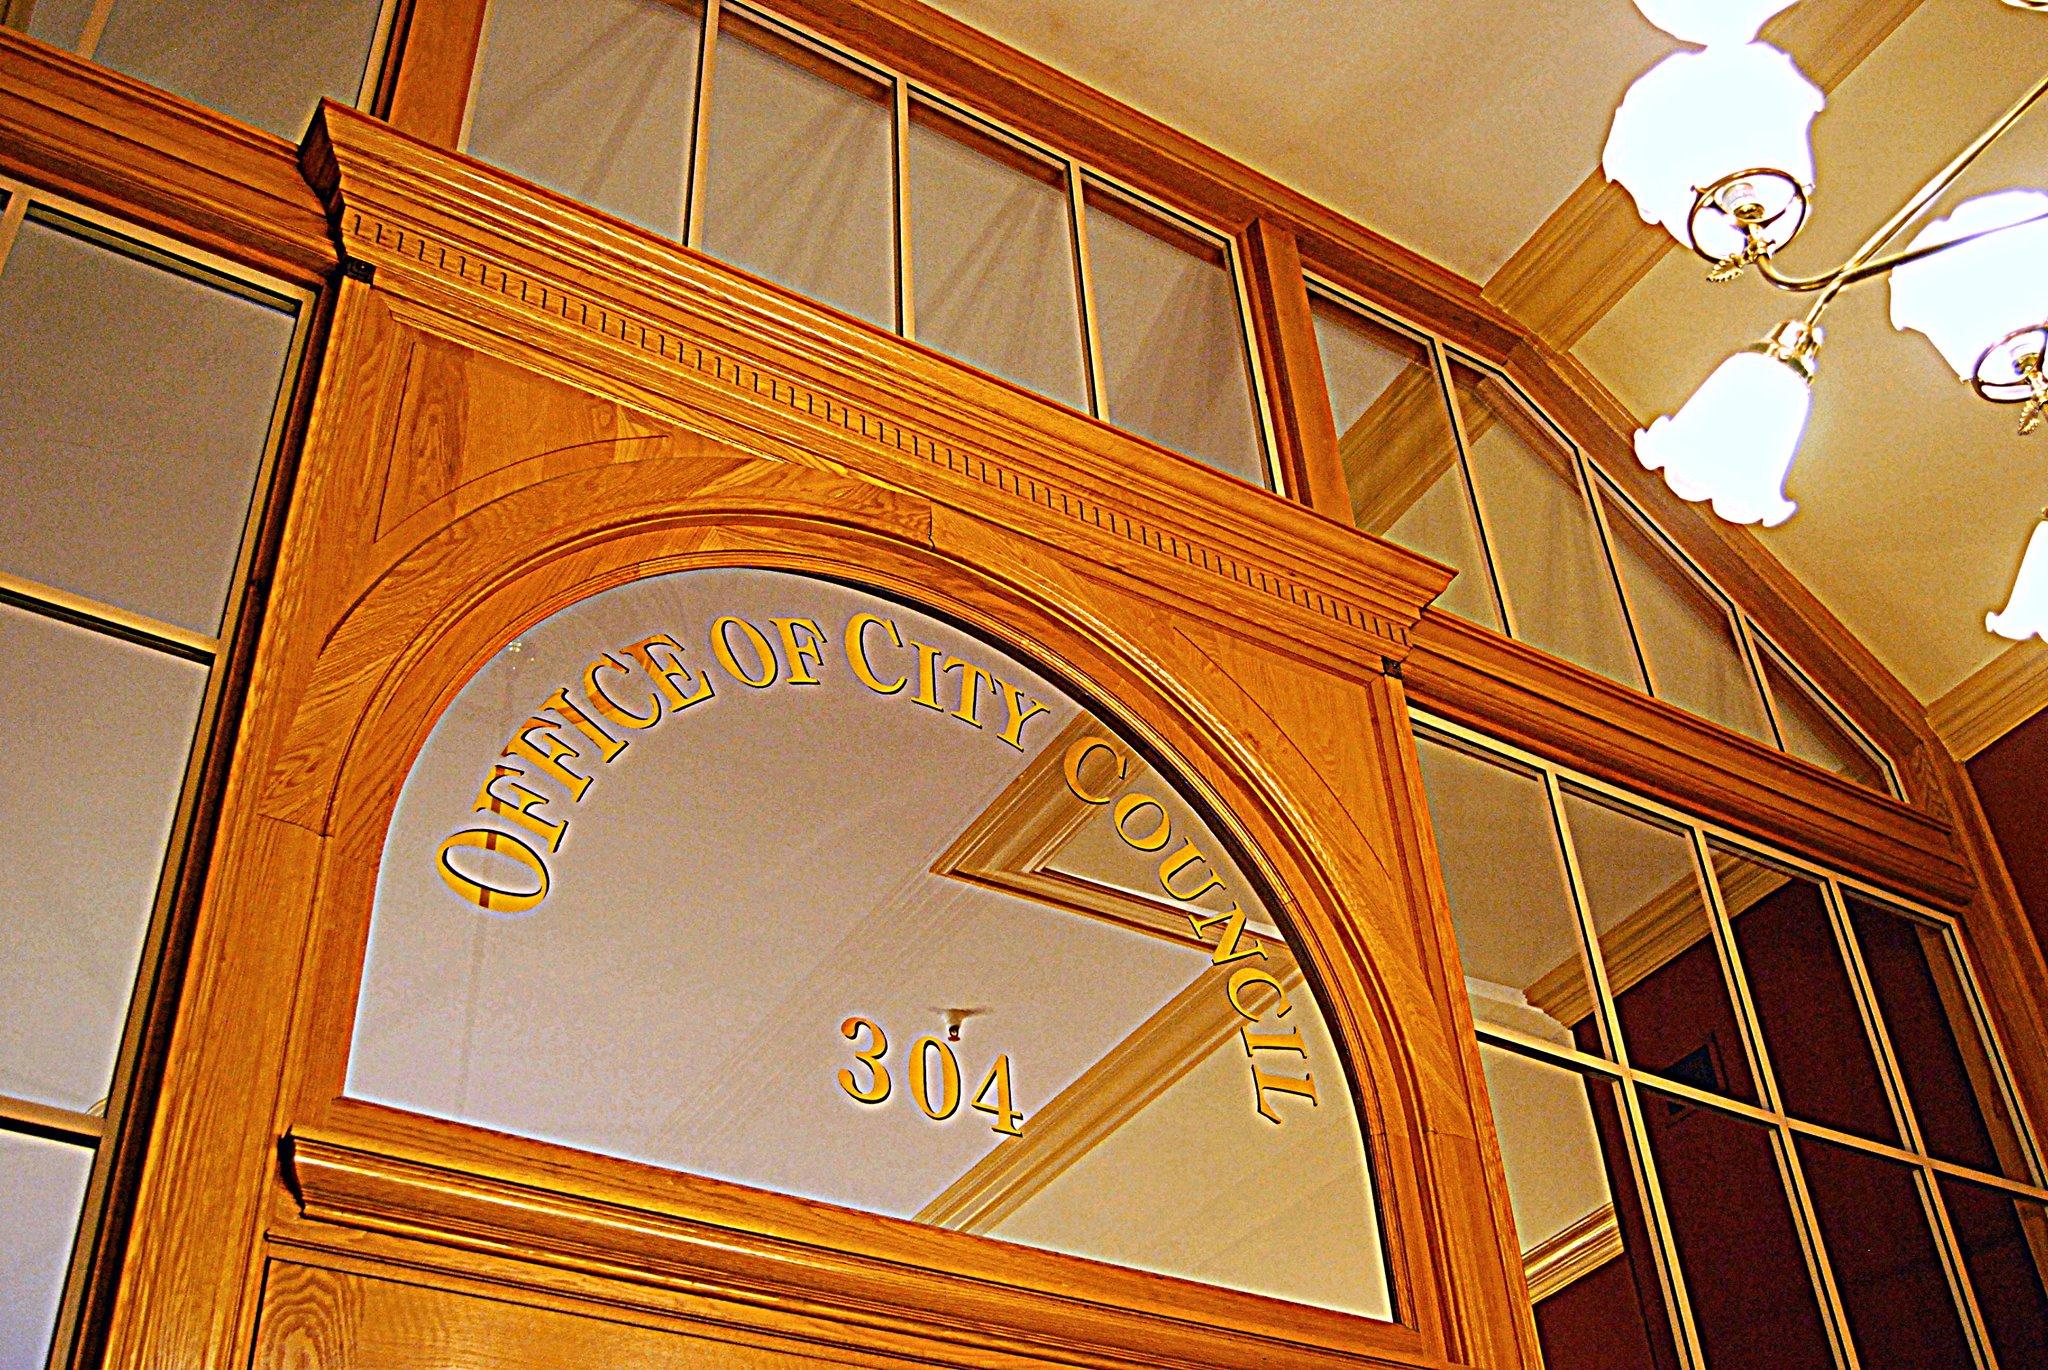 Council Office Entrance